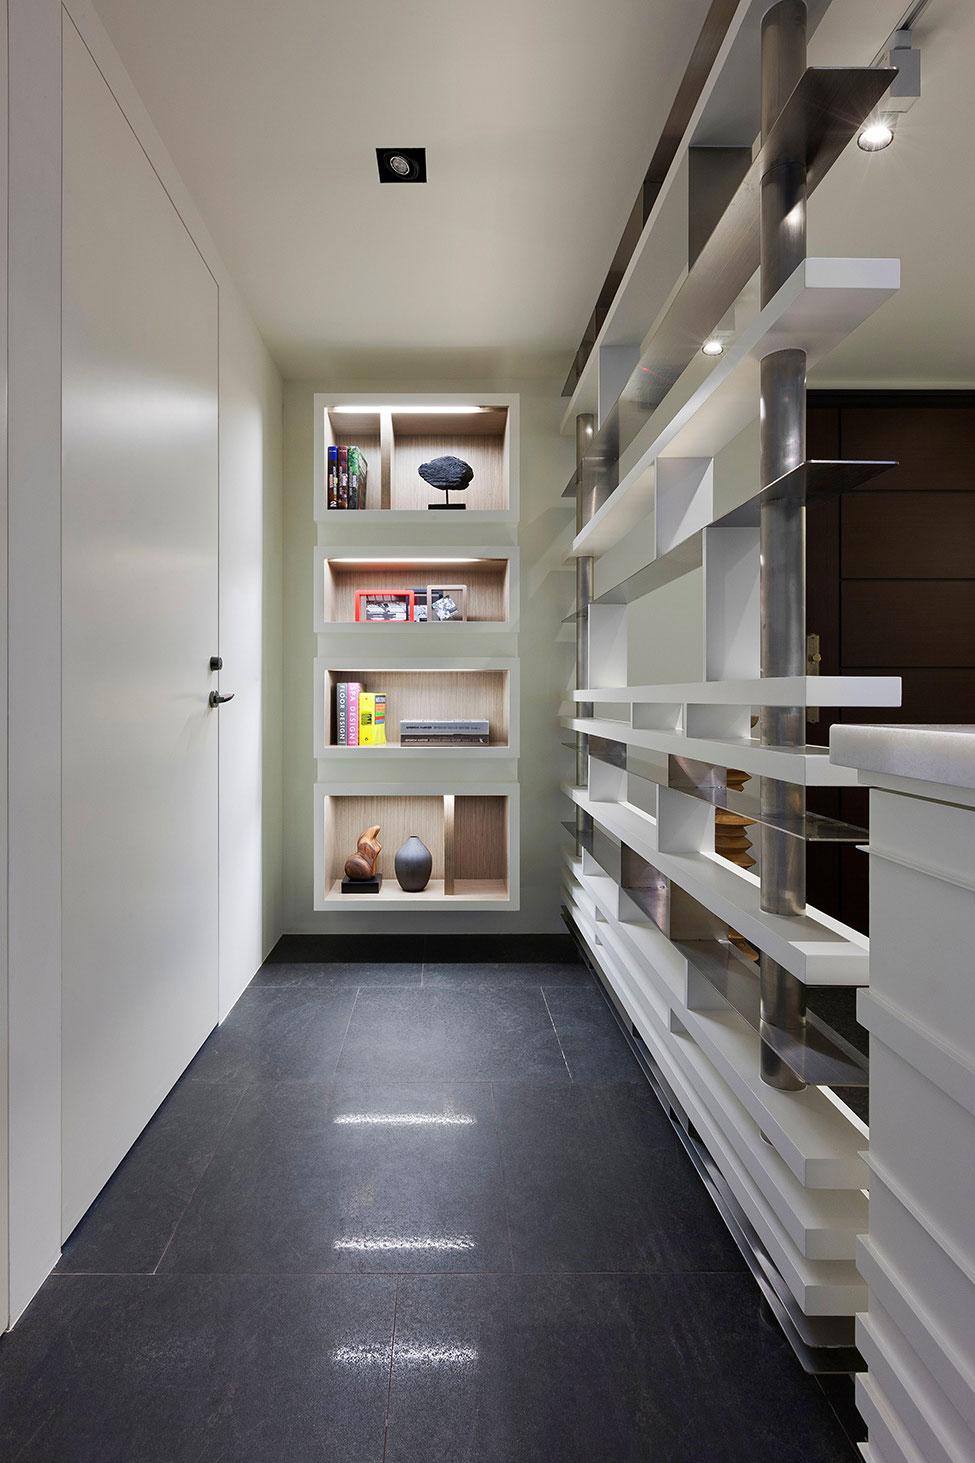 Lägenhet-omdesignad-med-ett-stort-öppet-utrymme-15 Lägenhet omformat med ett stort öppet utrymme av JC Architecture